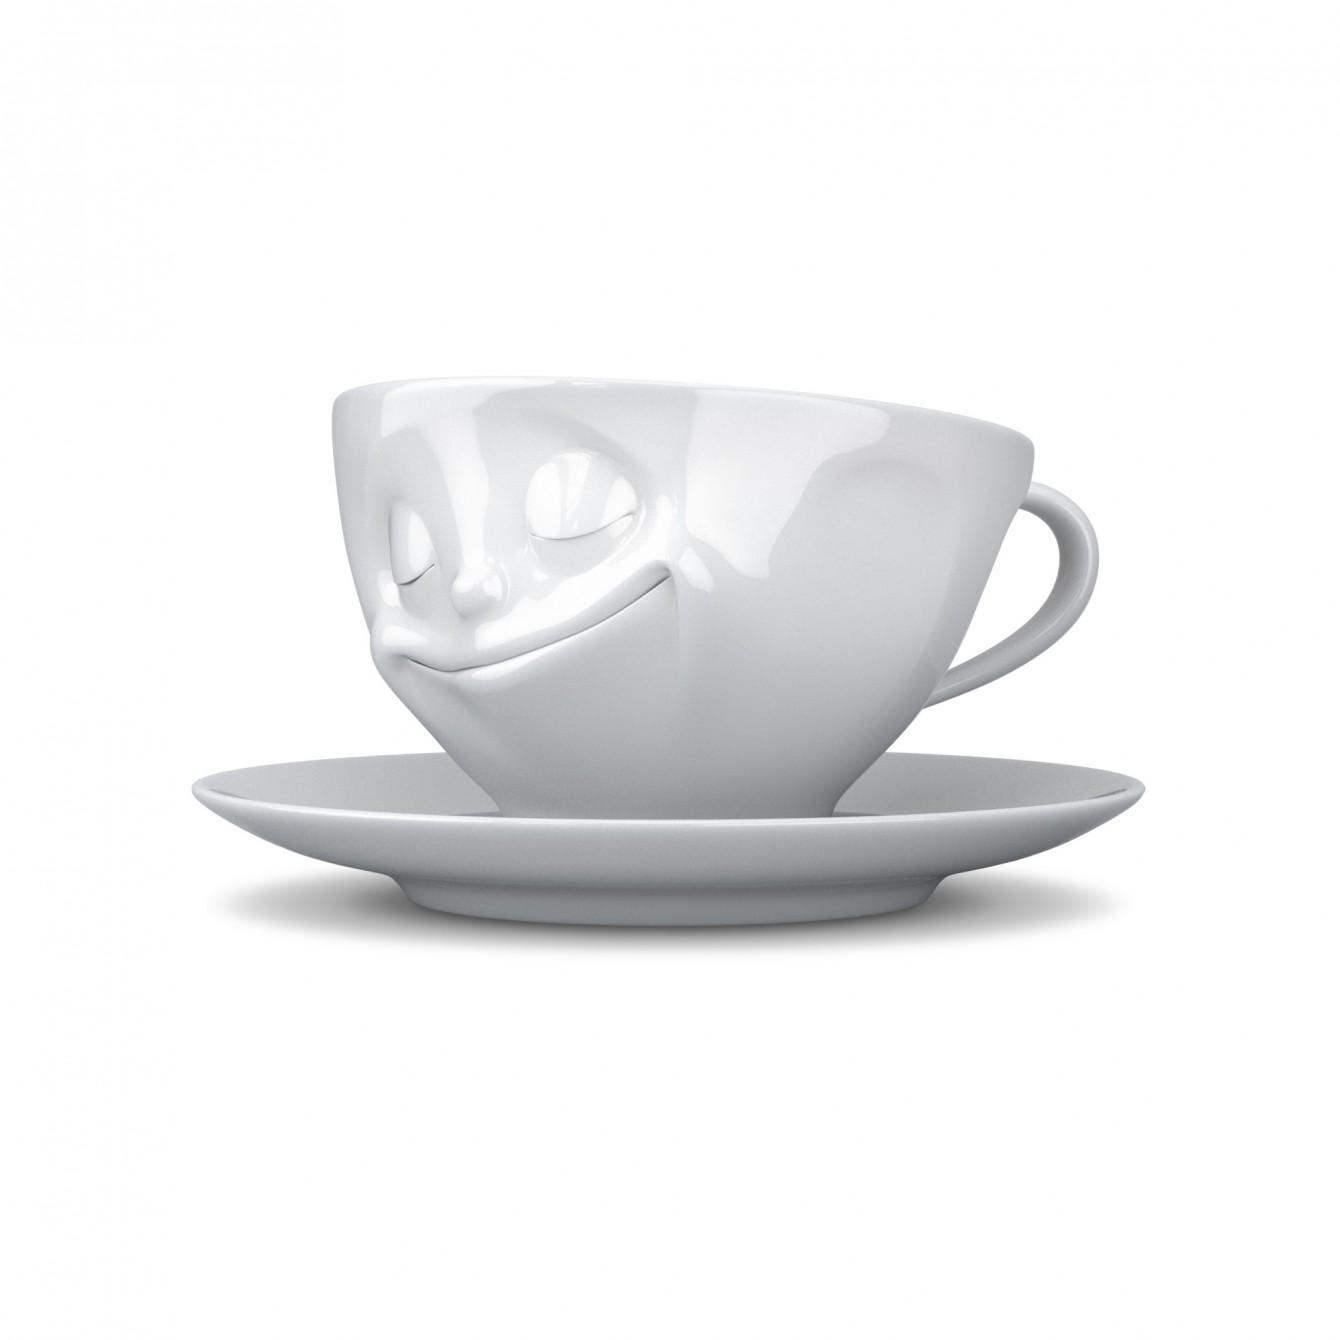 fiftyeight kaffee tasse gl cklich bennett shop. Black Bedroom Furniture Sets. Home Design Ideas